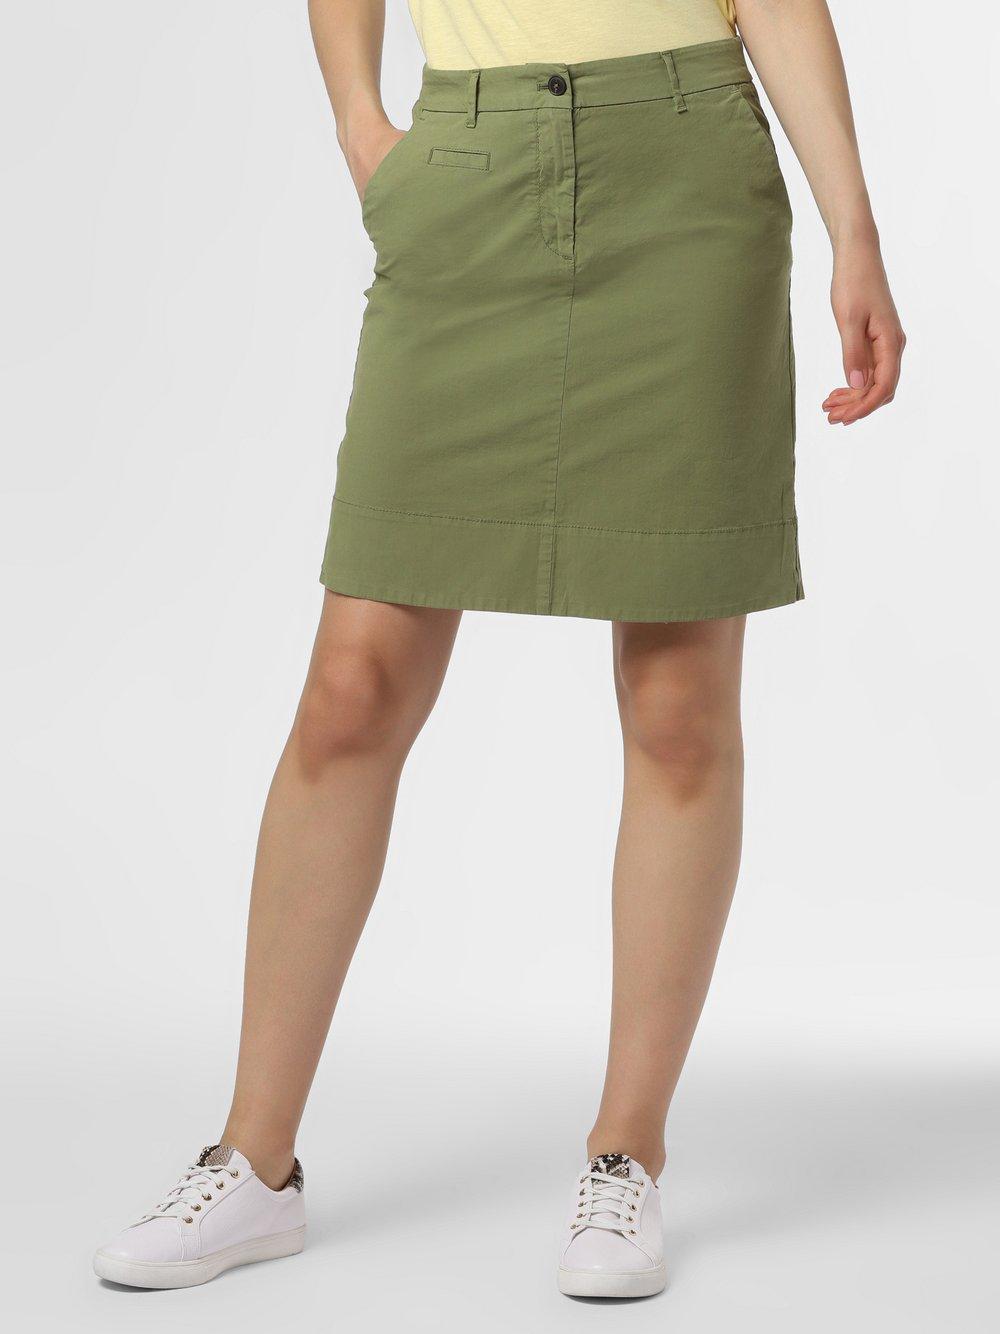 Marc O'Polo - Spódnica damska, zielony